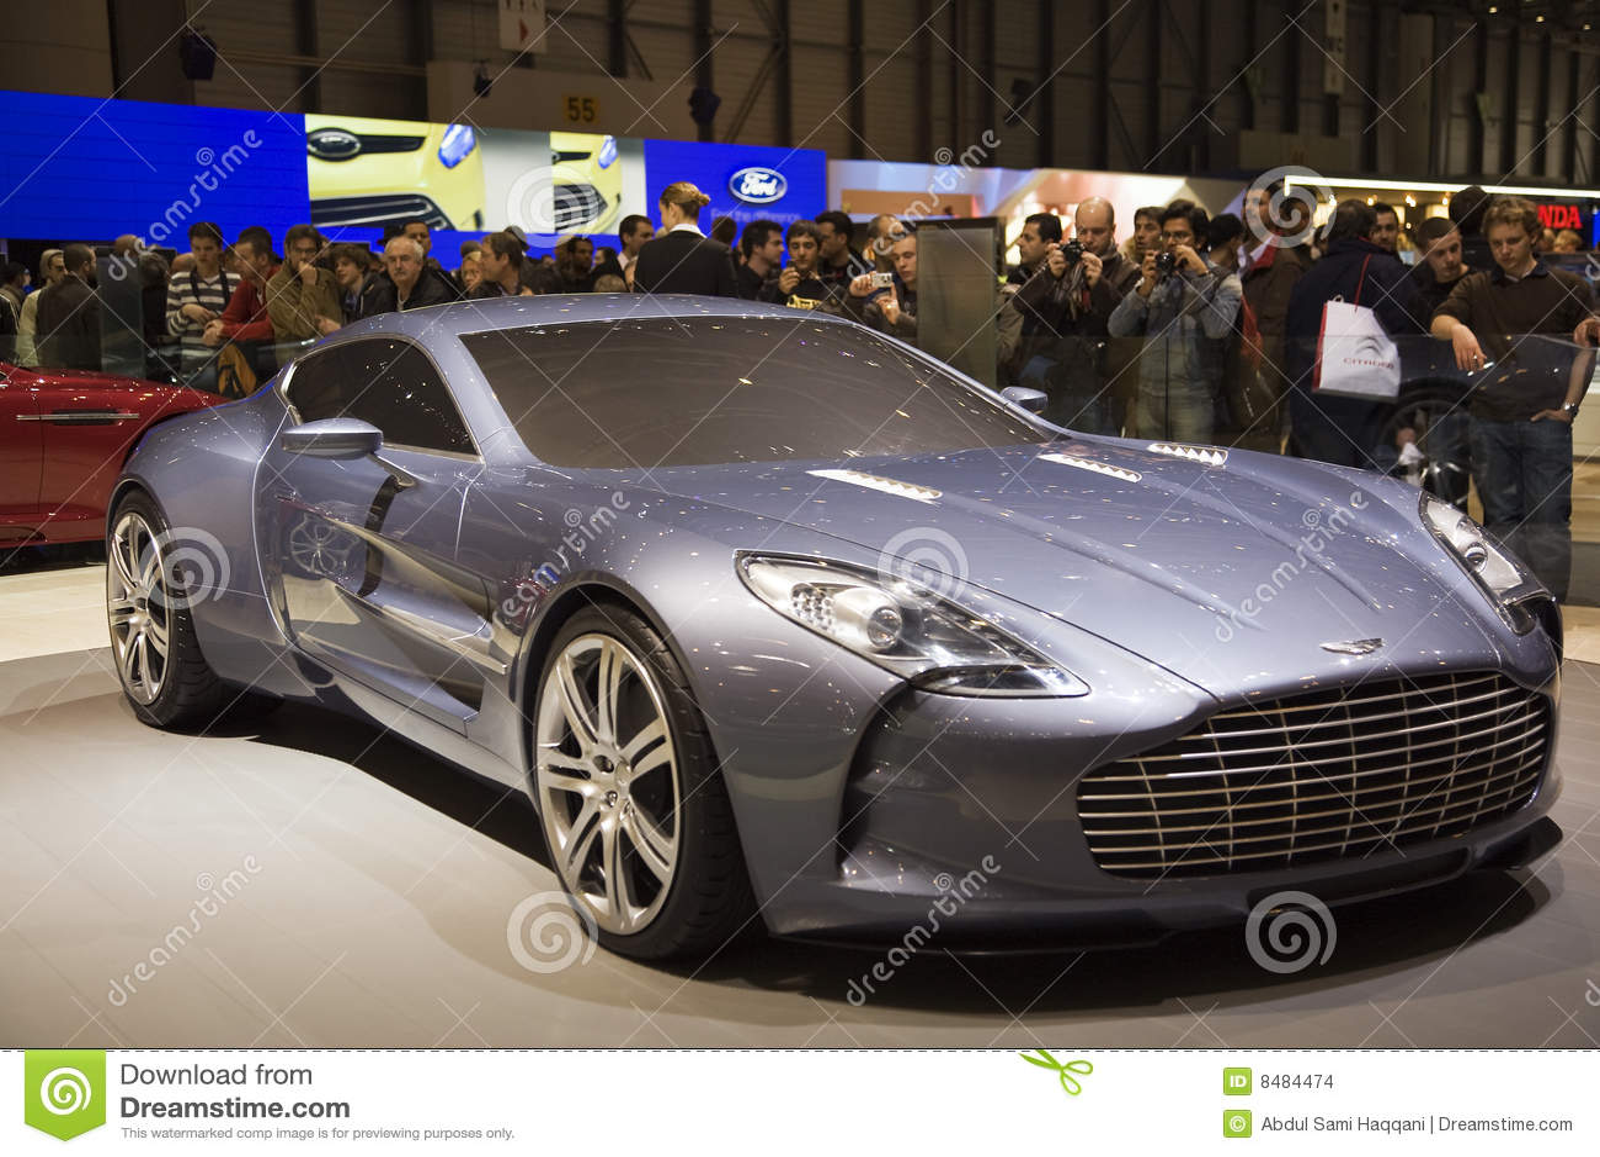 Geneva Motor Show - Aston Martin One 77